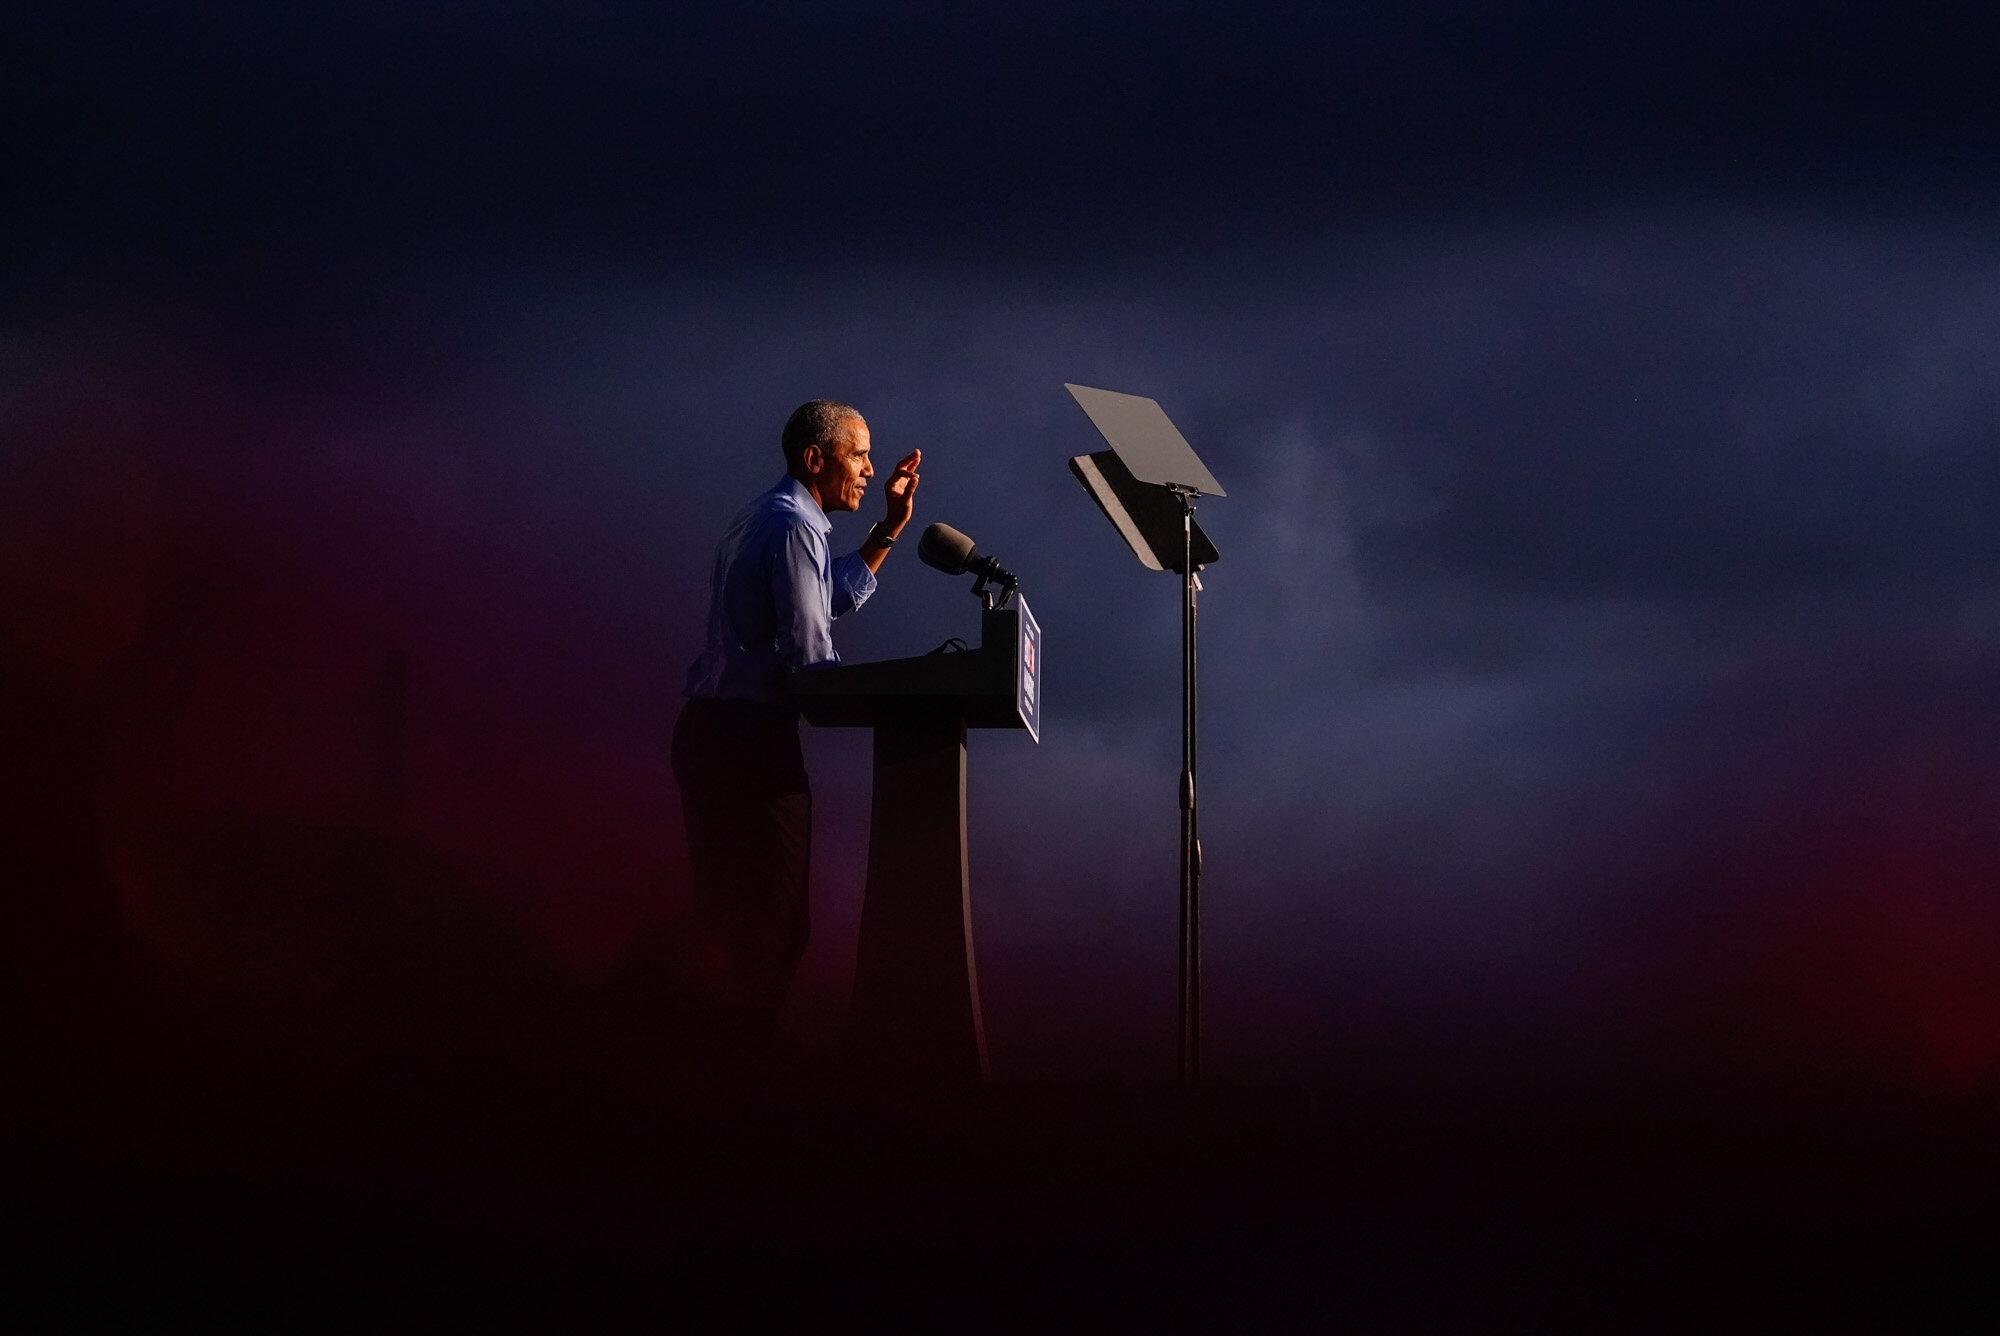 Former President Barack Obama speaks at Citizens Bank Park in Philadelphia as he campaigns for Democratic presidential candidate former Vice President Joe Biden on Oct. 21, 2020. (AP Photo/ Matt Slocum)